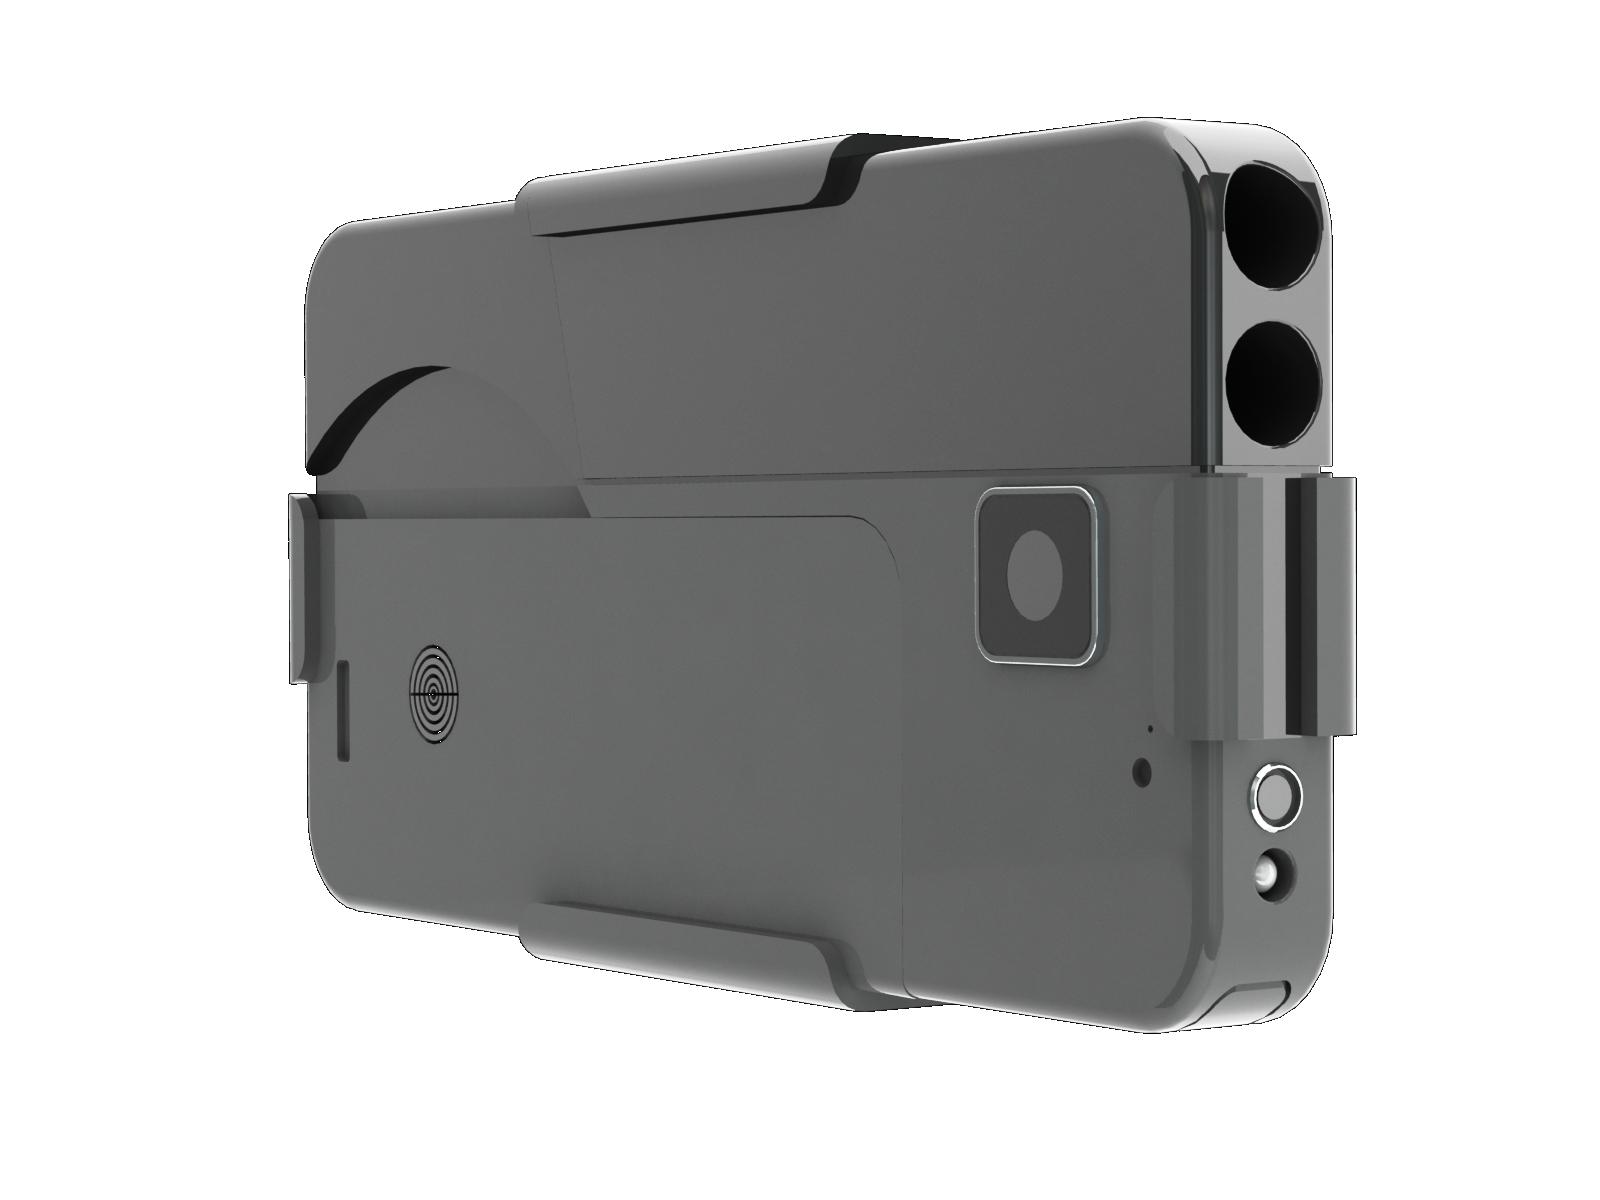 Ideal Conceal iPhone-like Gun